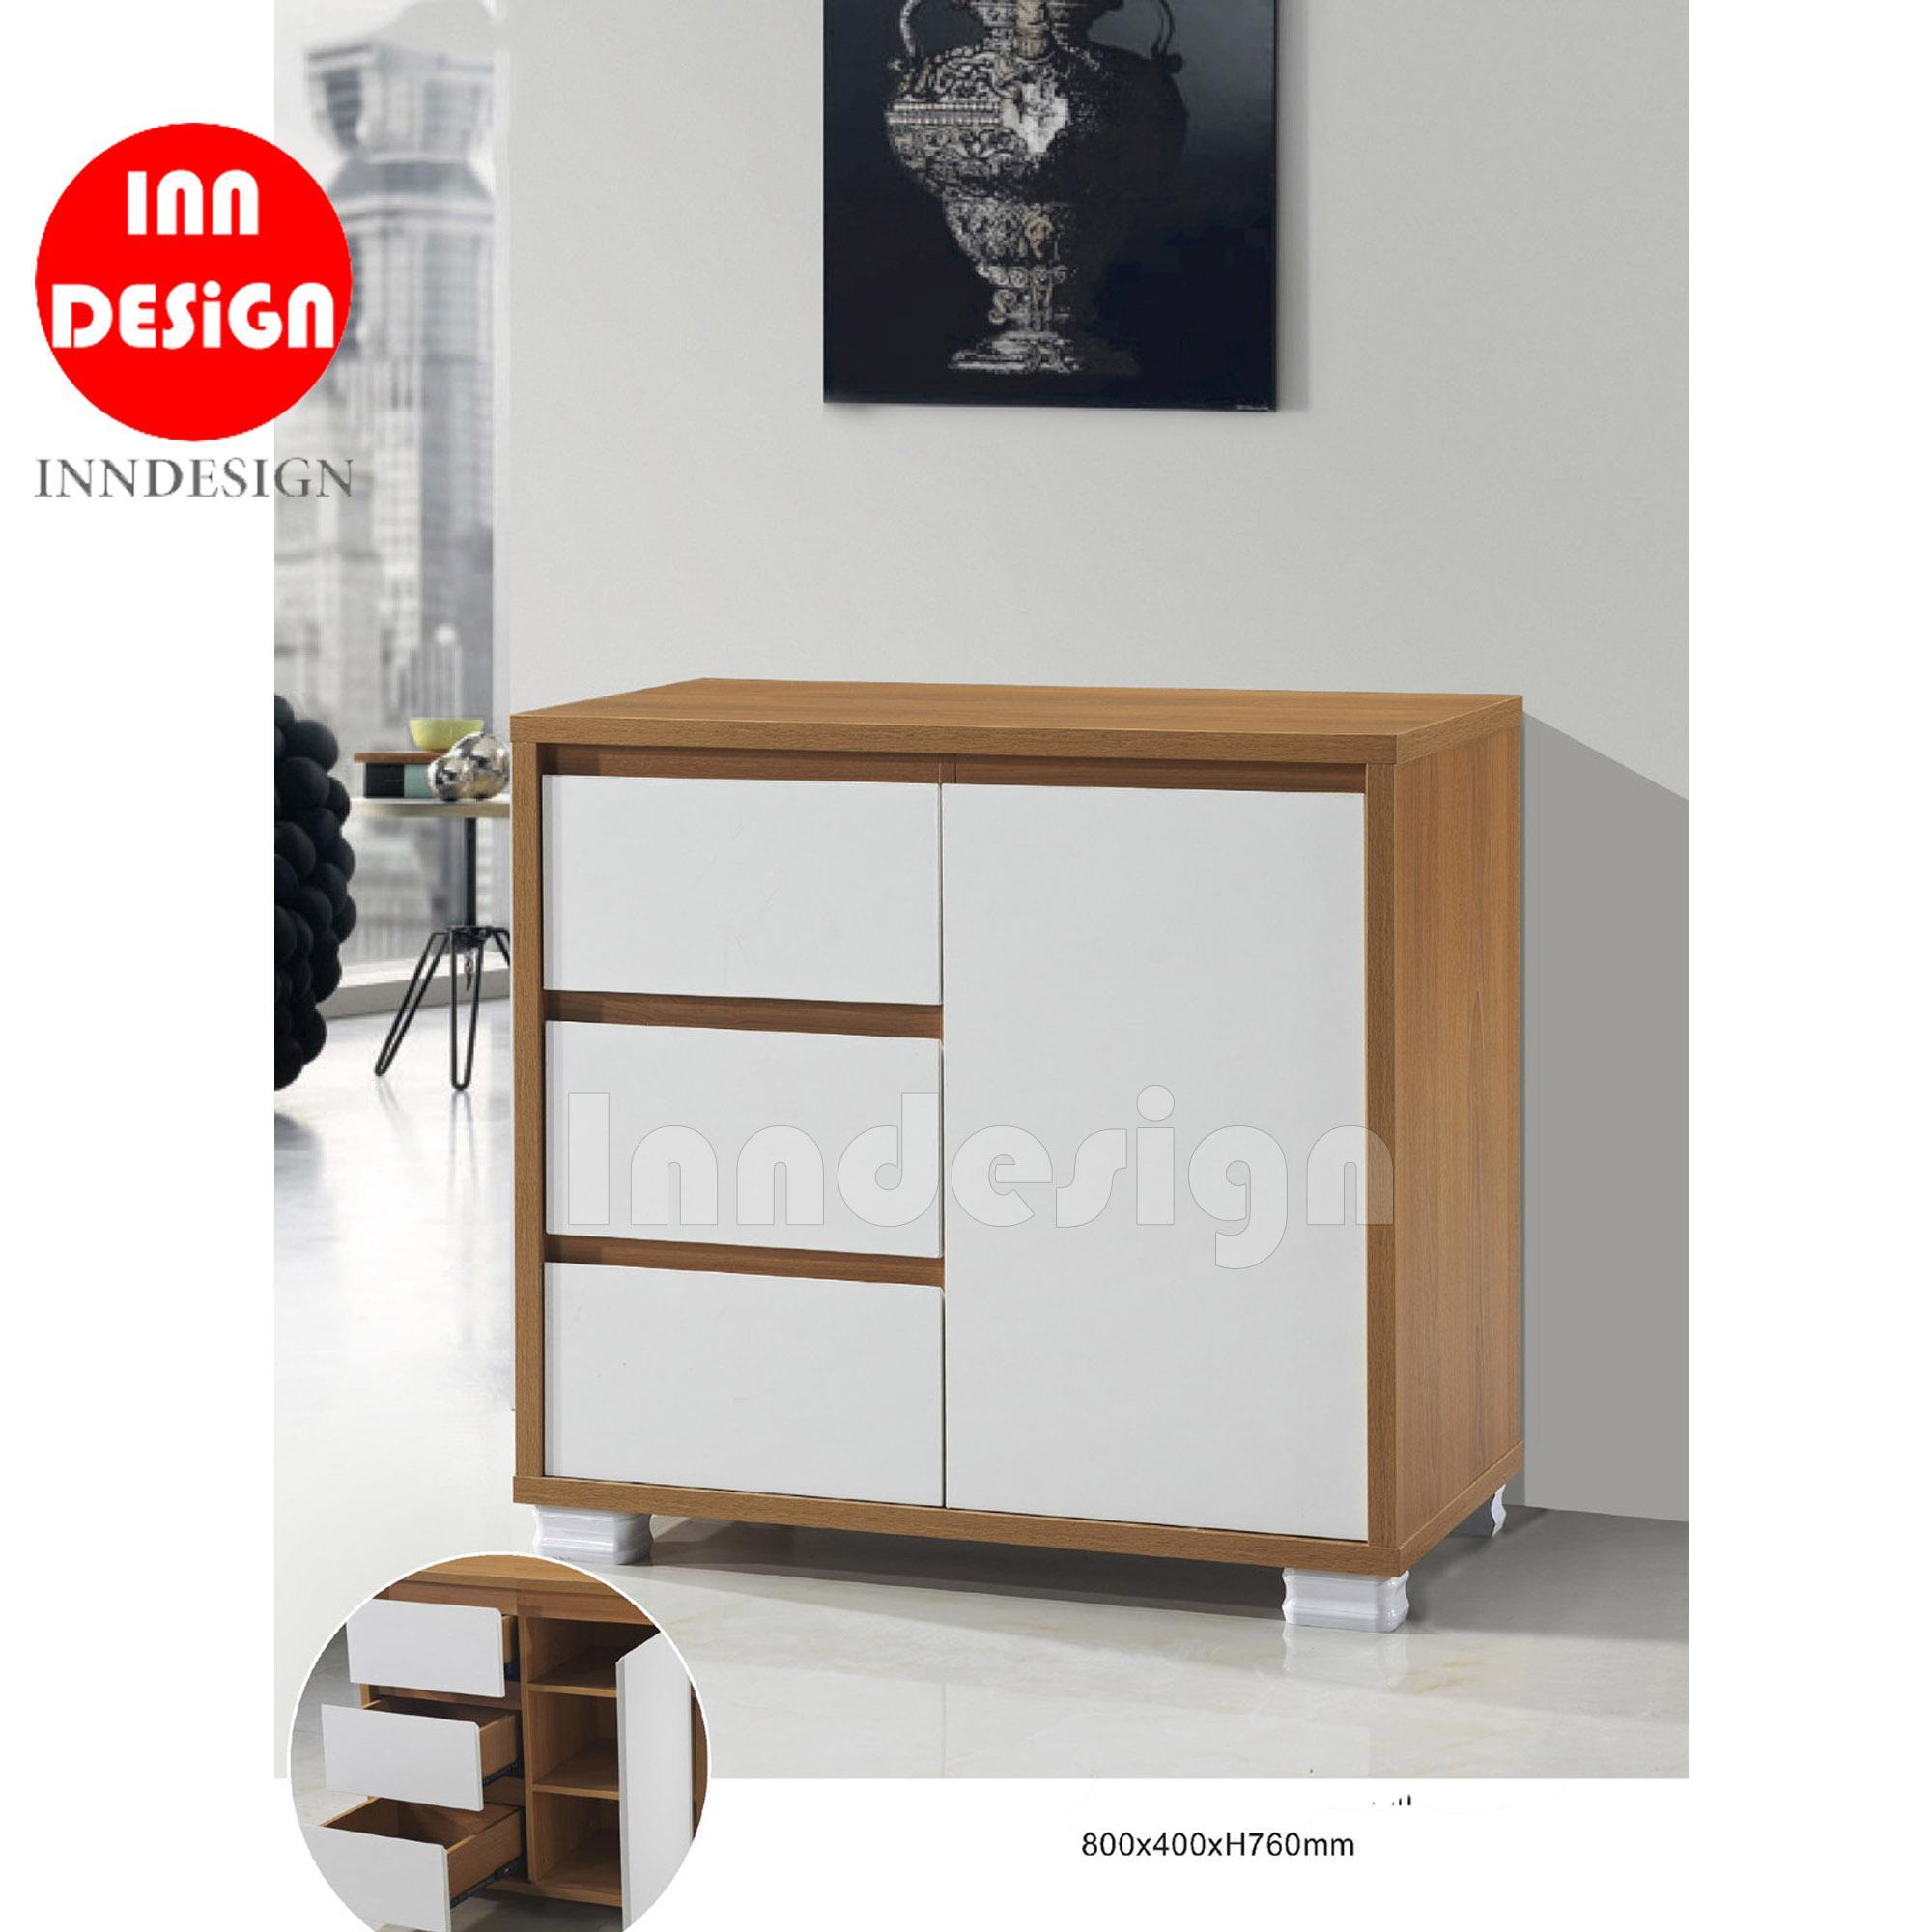 Barndick Storage Cabinet / Bookshelf / Display Cabinet